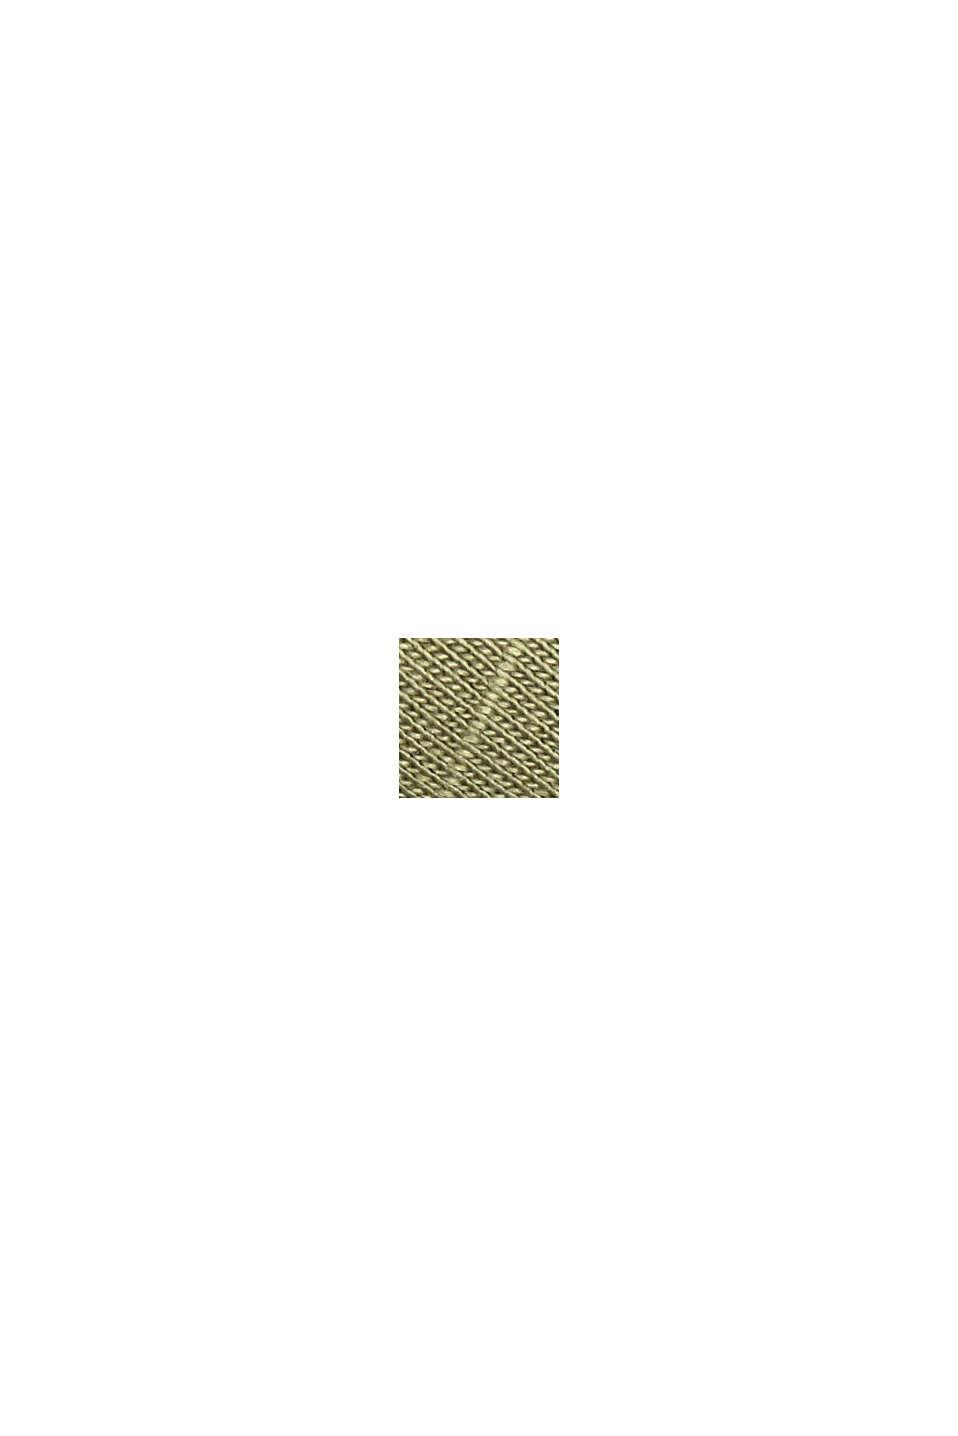 CURVY Longsleeve mit Organic Cotton/TENCEL™, LIGHT KHAKI, swatch